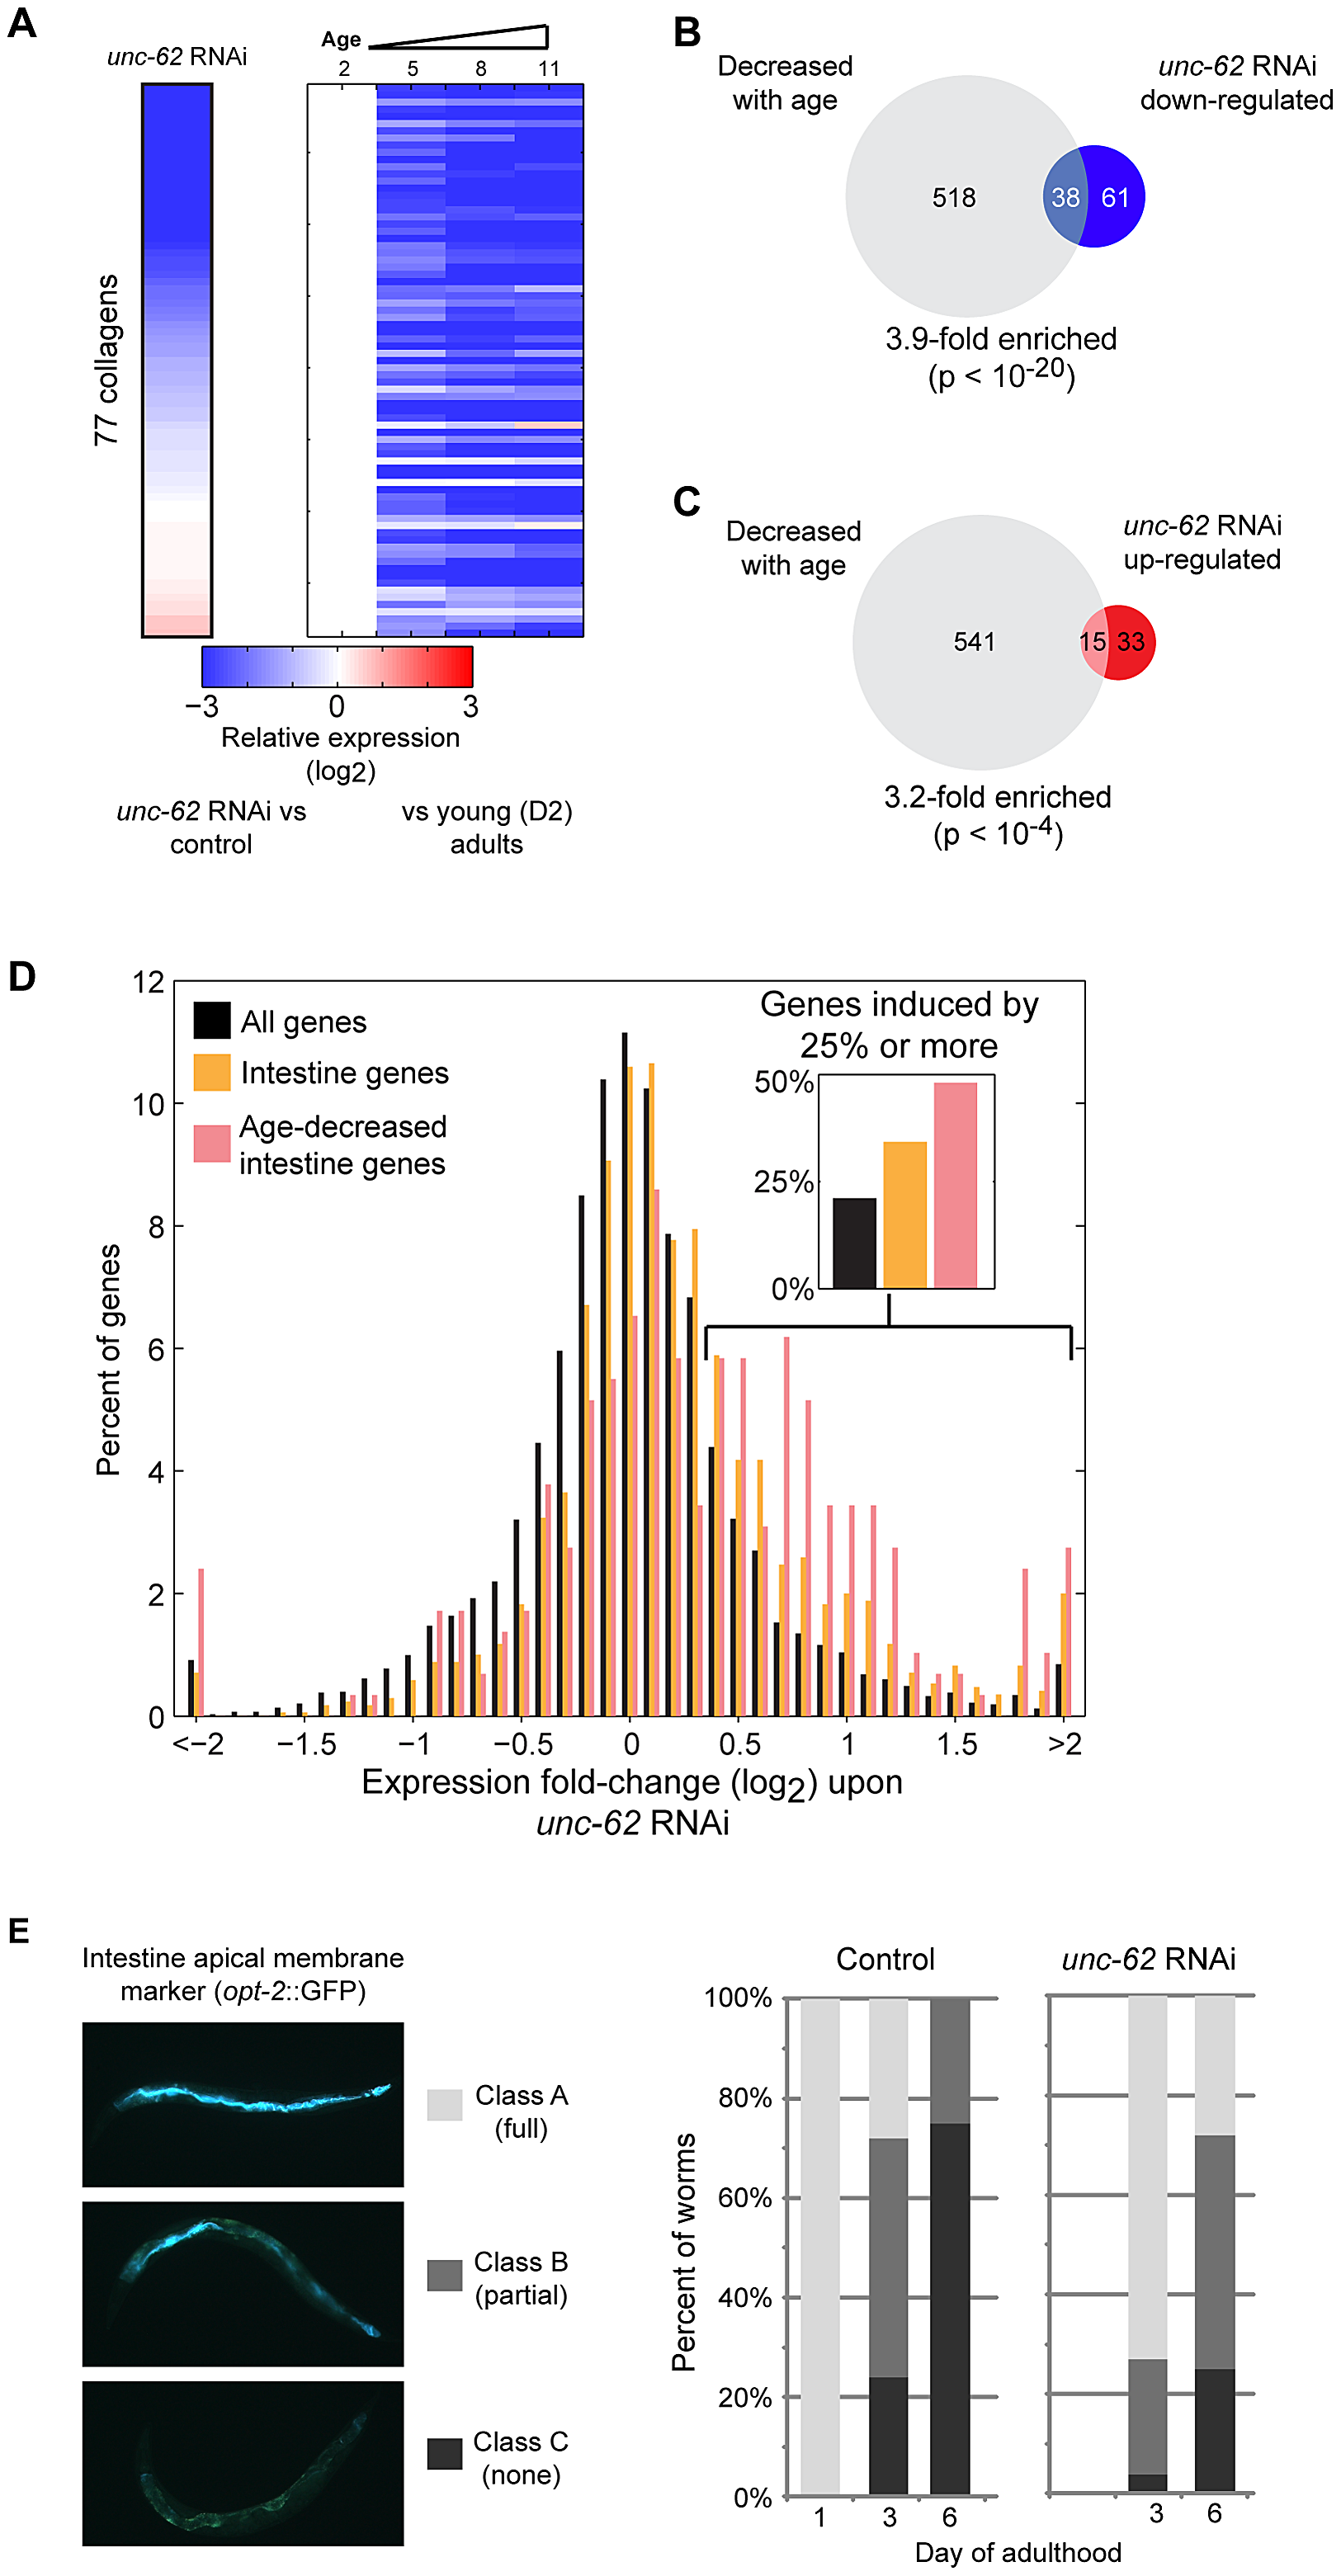 UNC-62 RNAi decreases expression of collagen genes and increases expression of intestinal genes.